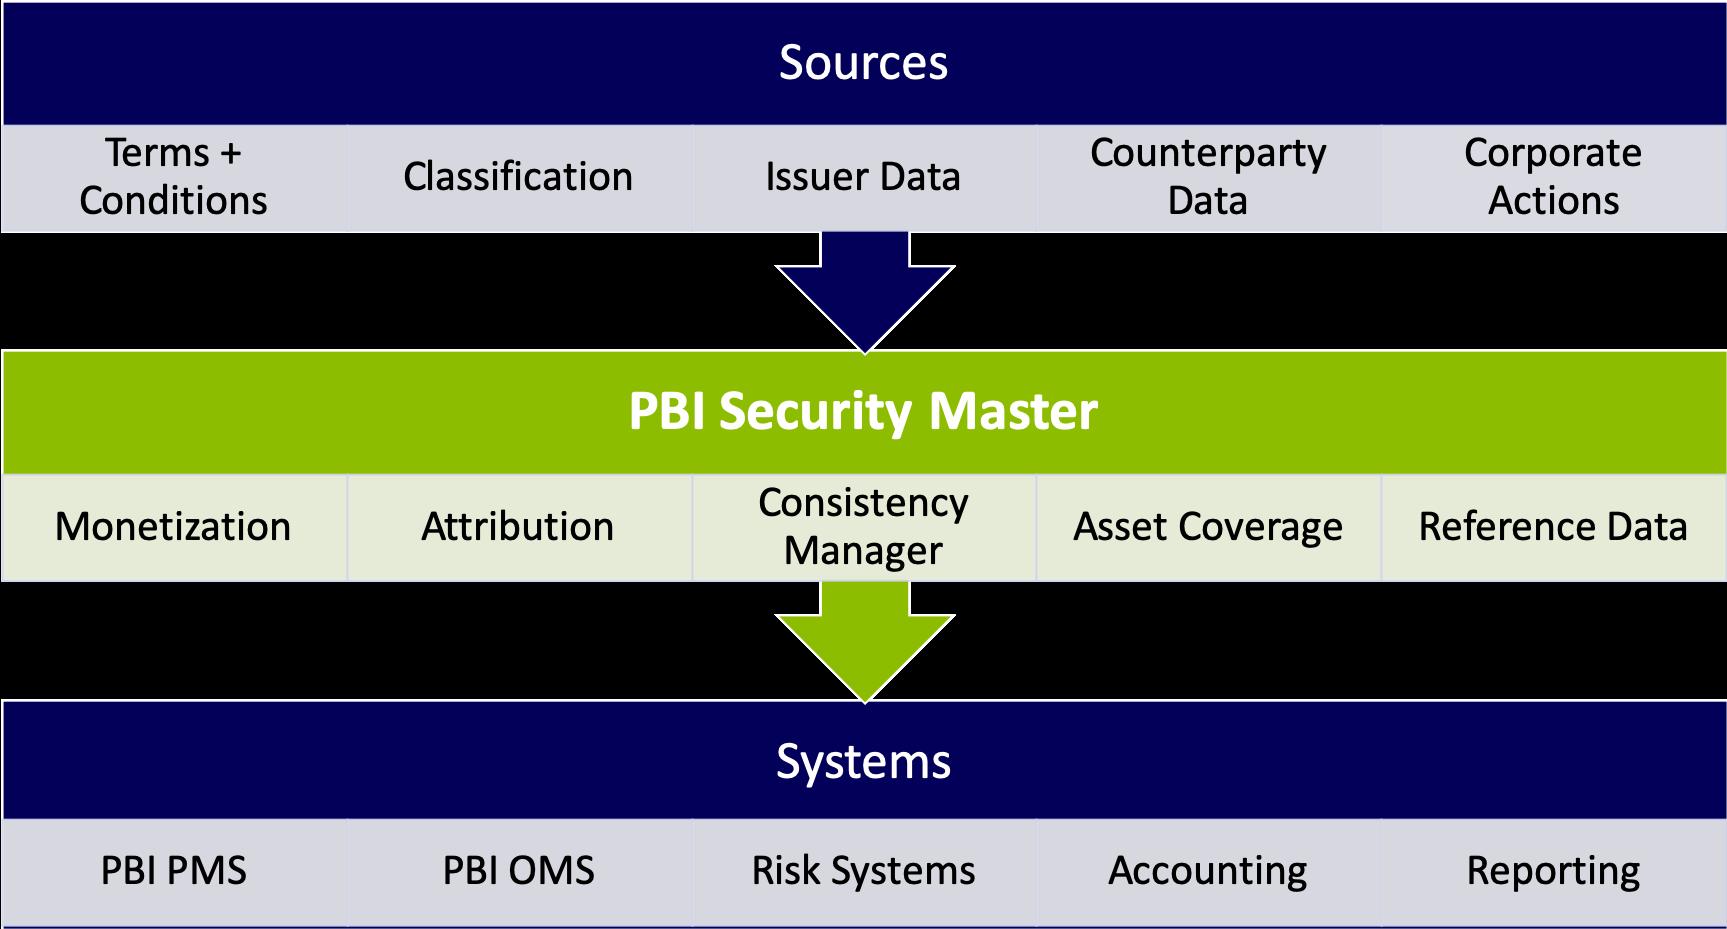 PBI Security Master diagram of an organizations workflow.